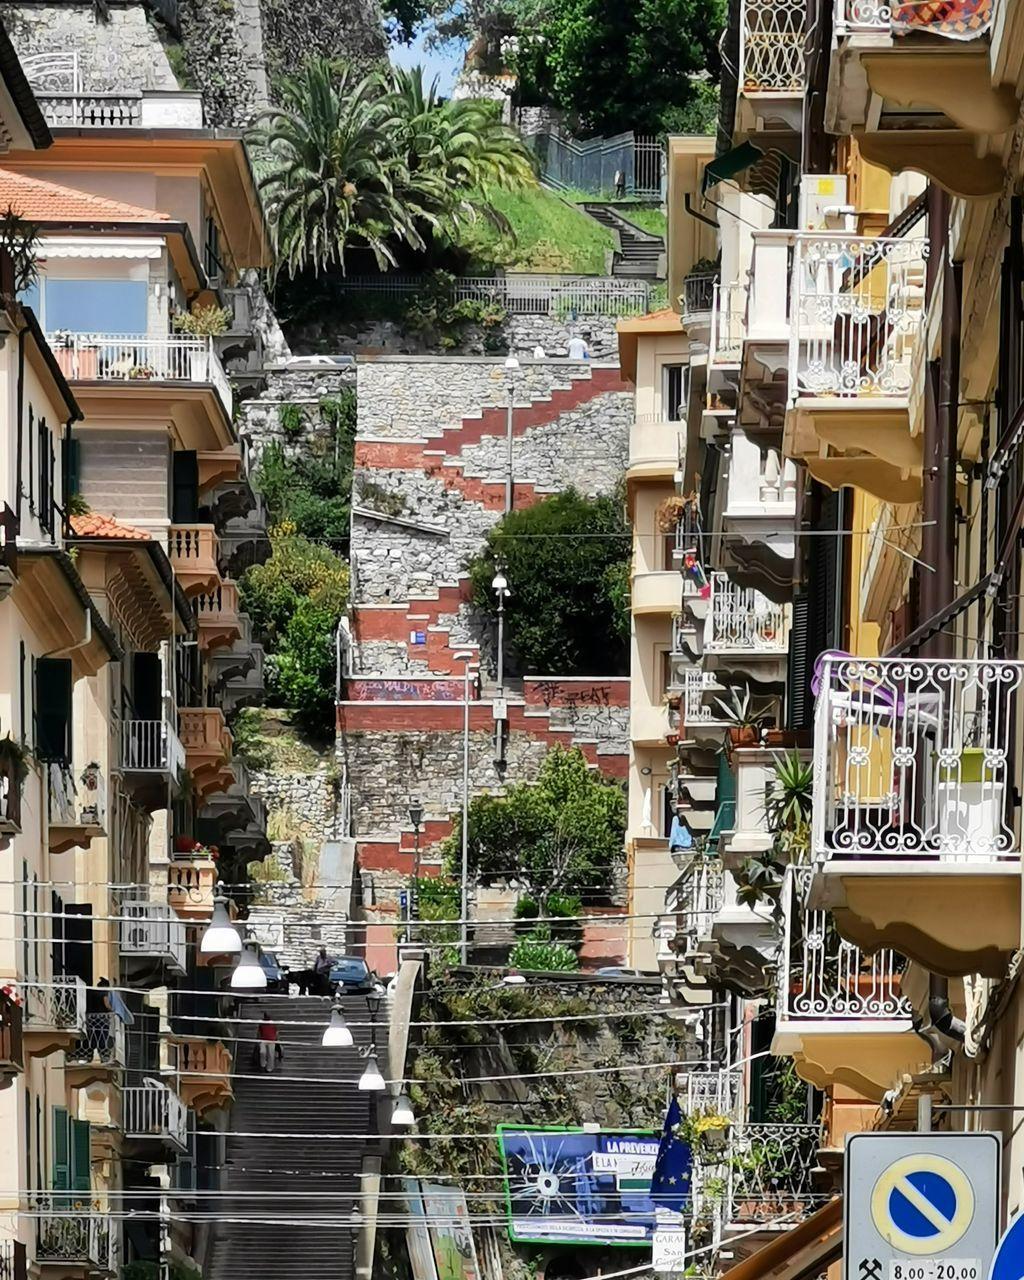 VIEW OF RESIDENTIAL BUILDINGS